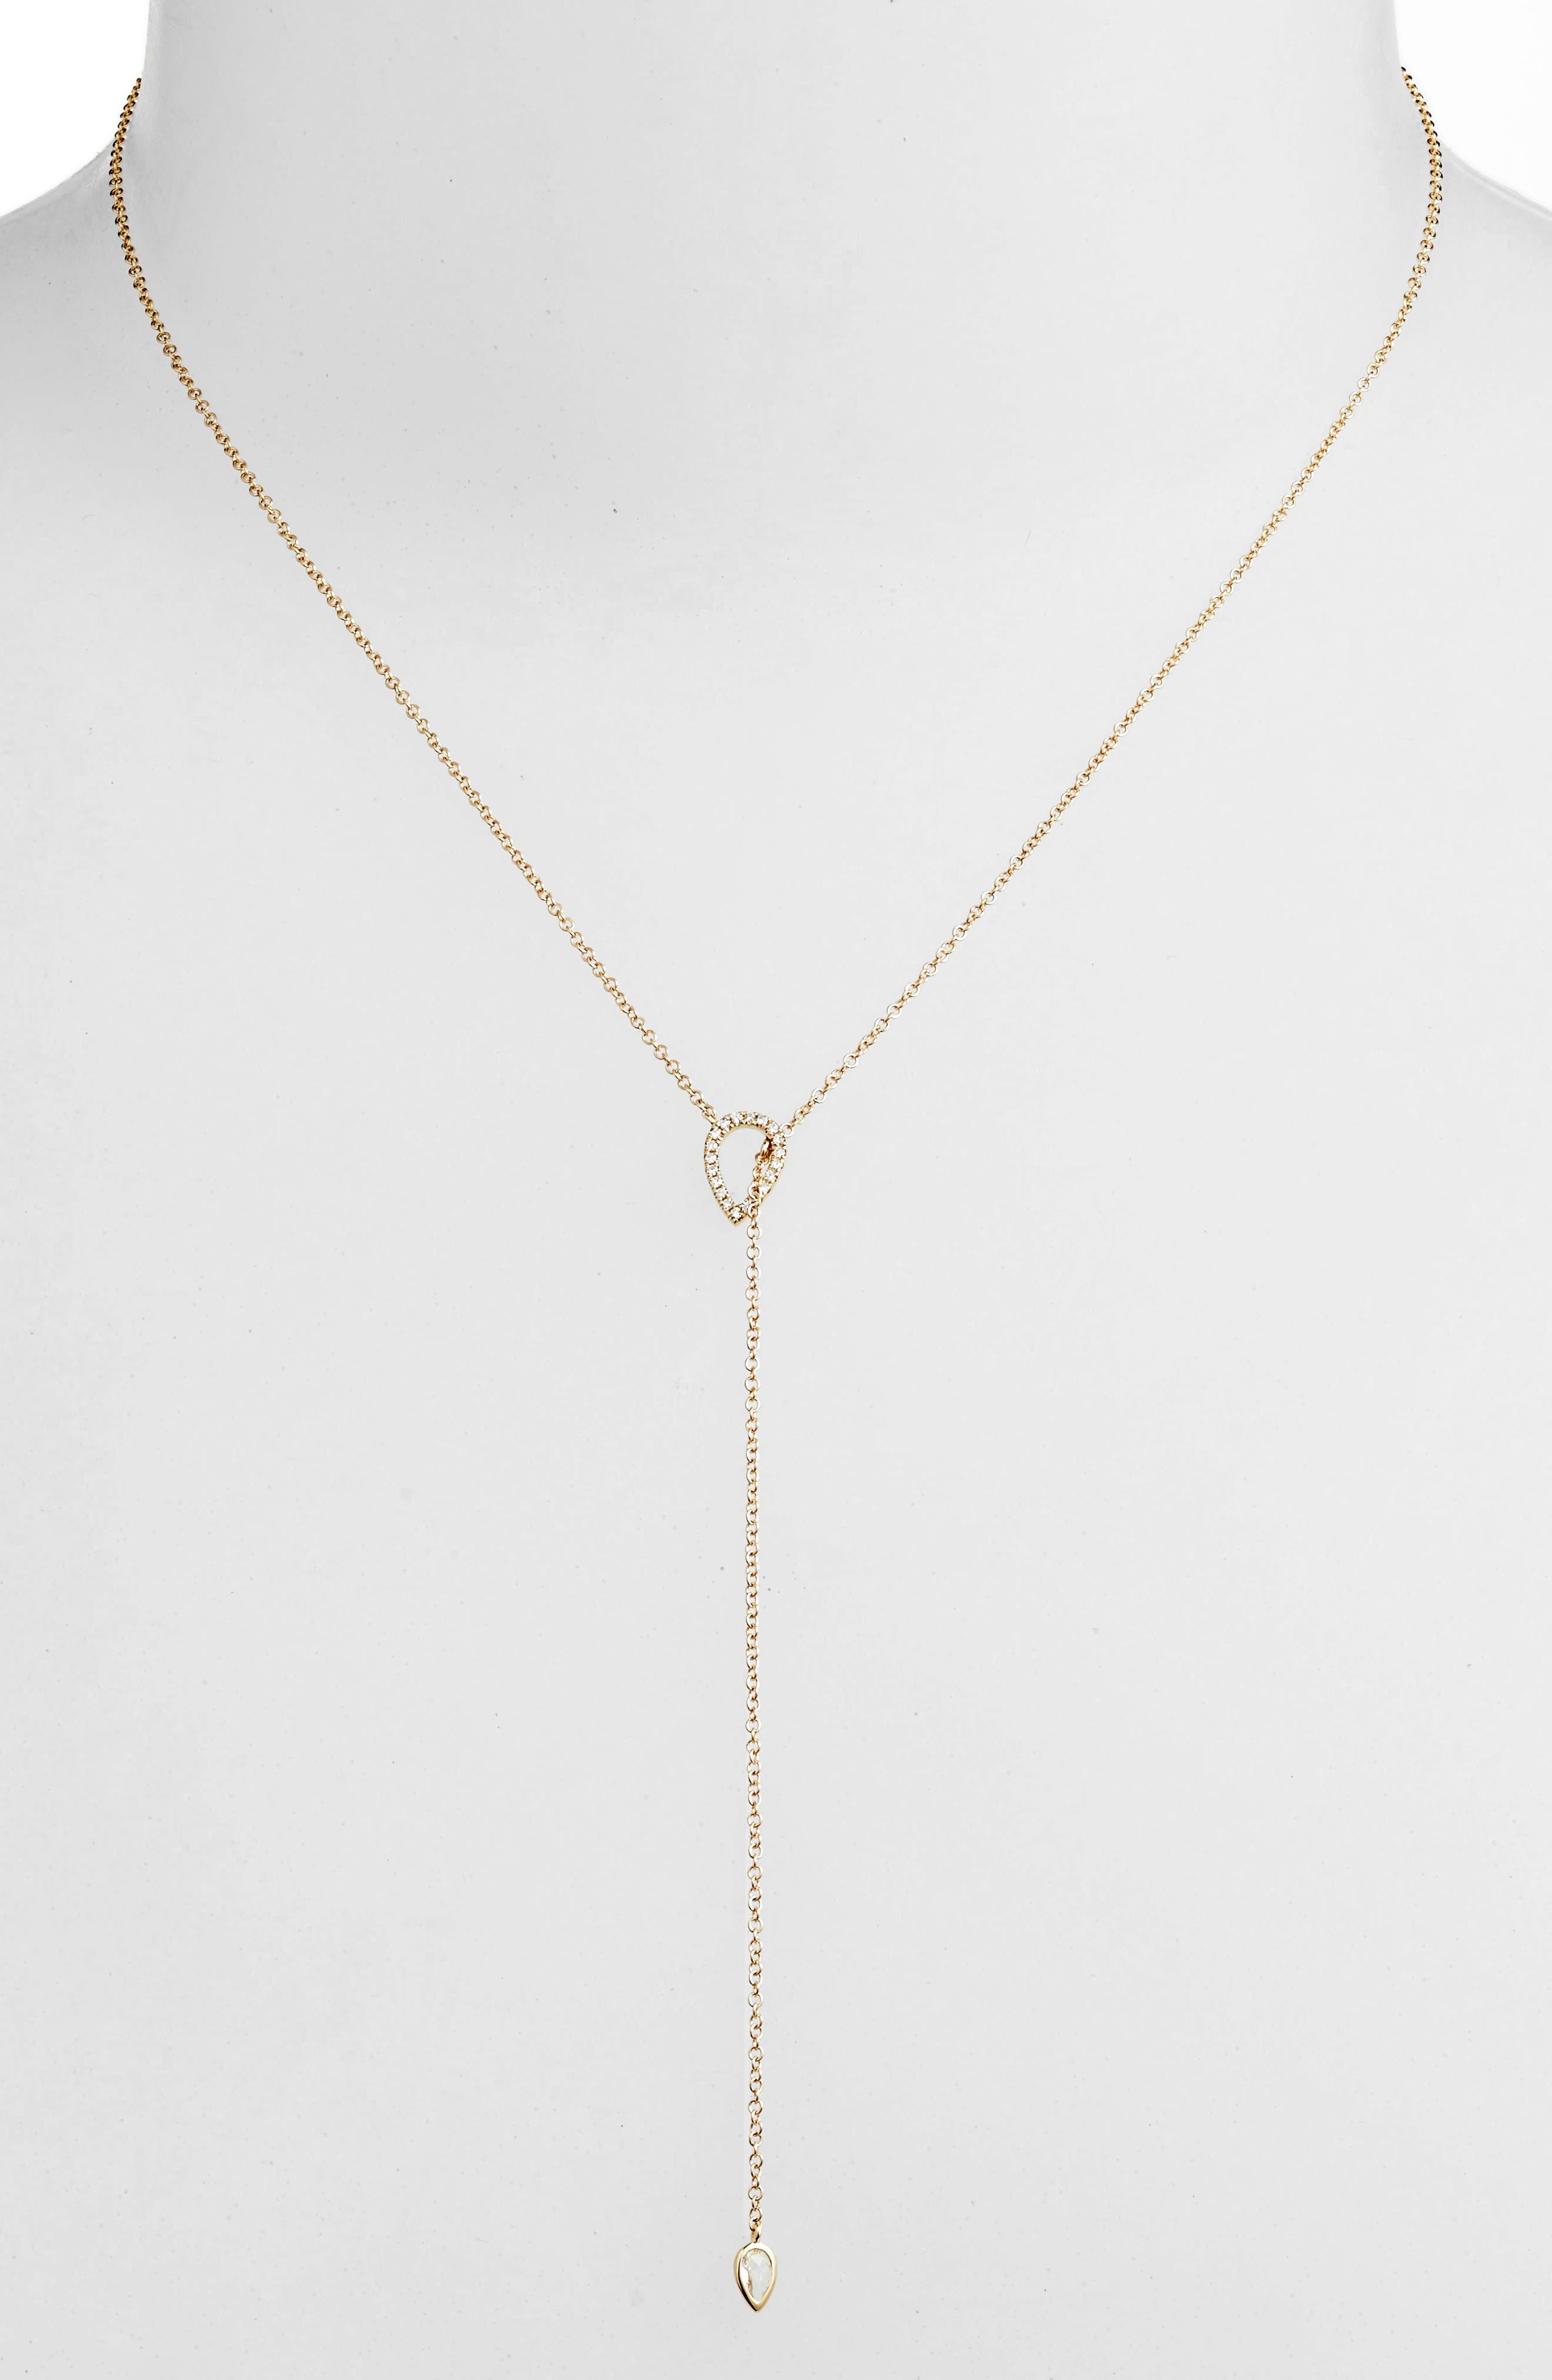 Teardrop Diamond Lariat Necklace,                             Alternate thumbnail 2, color,                             YELLOW GOLD